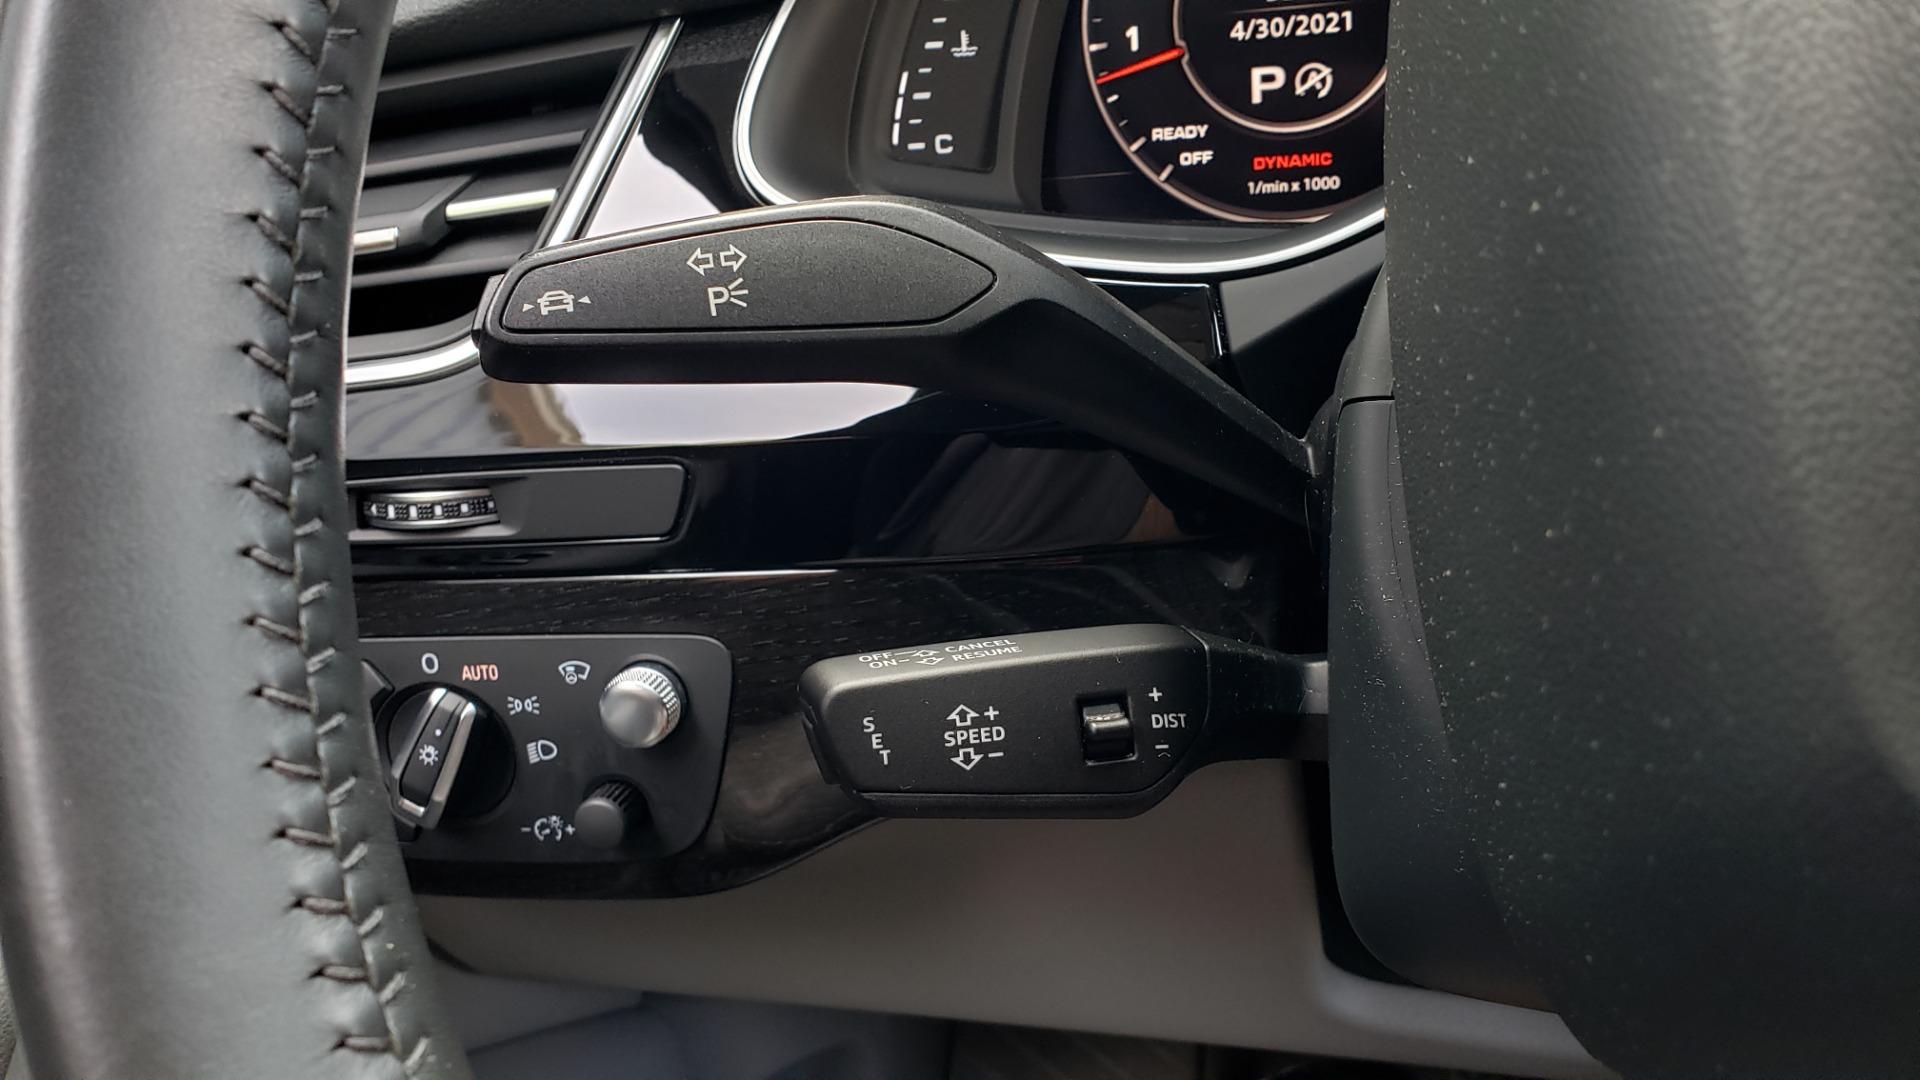 Used 2018 Audi Q7 PRESTIGE TIPTRONIC / NAV / SUNROOF / ADAPTIVE PKG / DRVR ASST / CLD WTHR /  for sale $49,995 at Formula Imports in Charlotte NC 28227 44